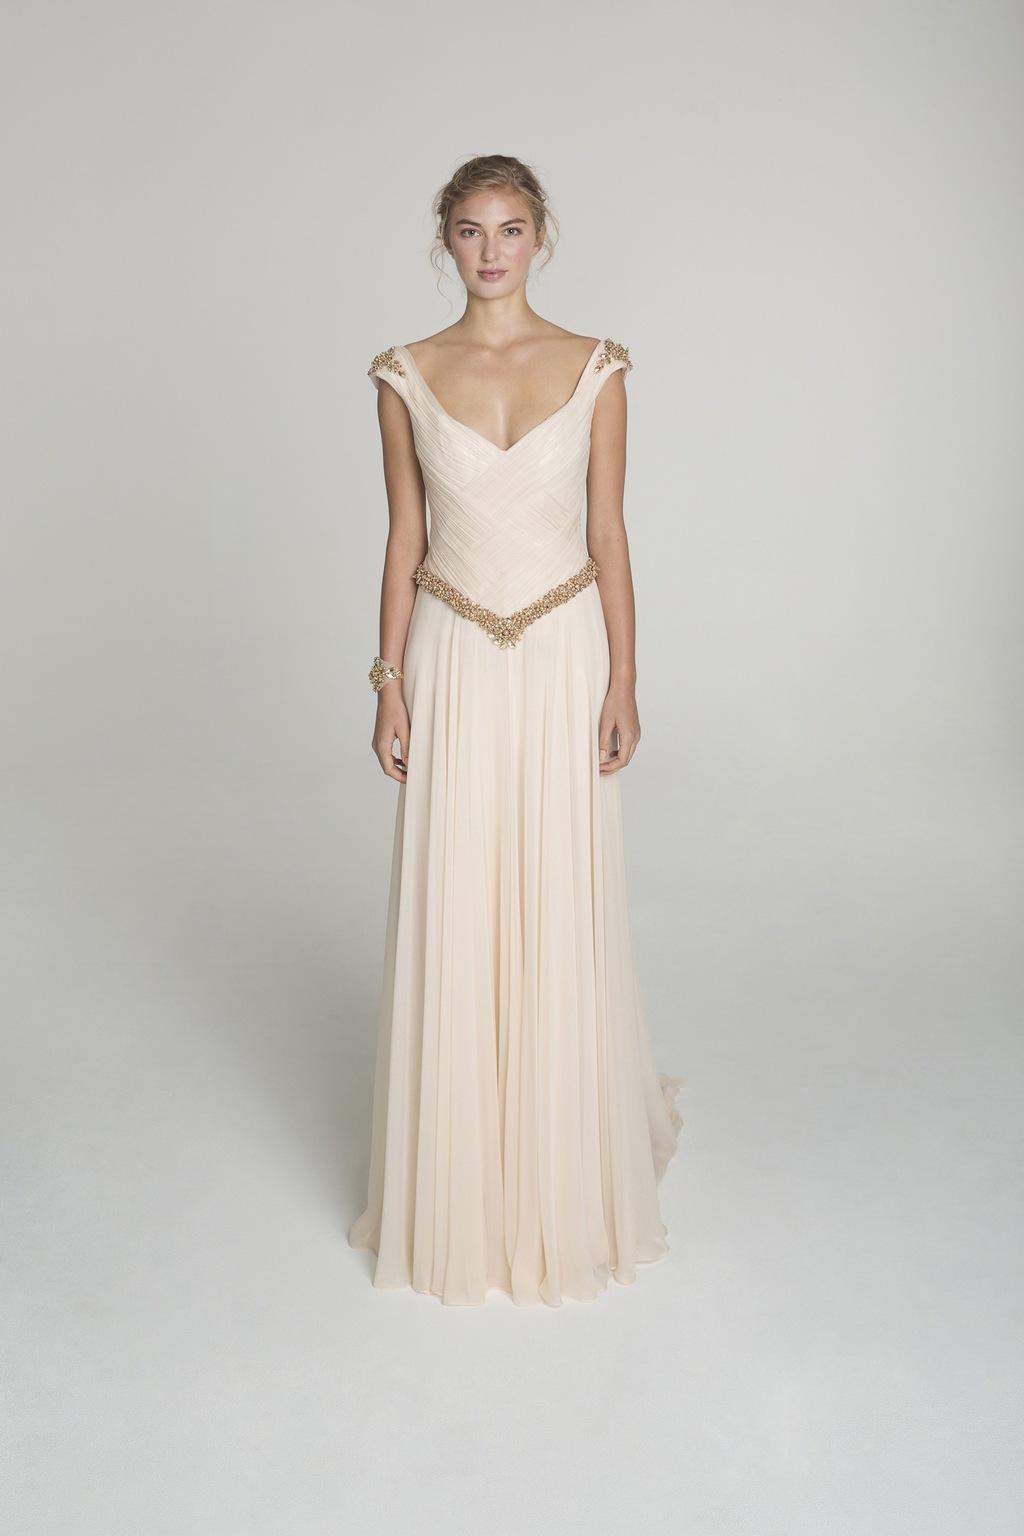 Blush_and_gold_wedding_dress_from_alana_aoun.full